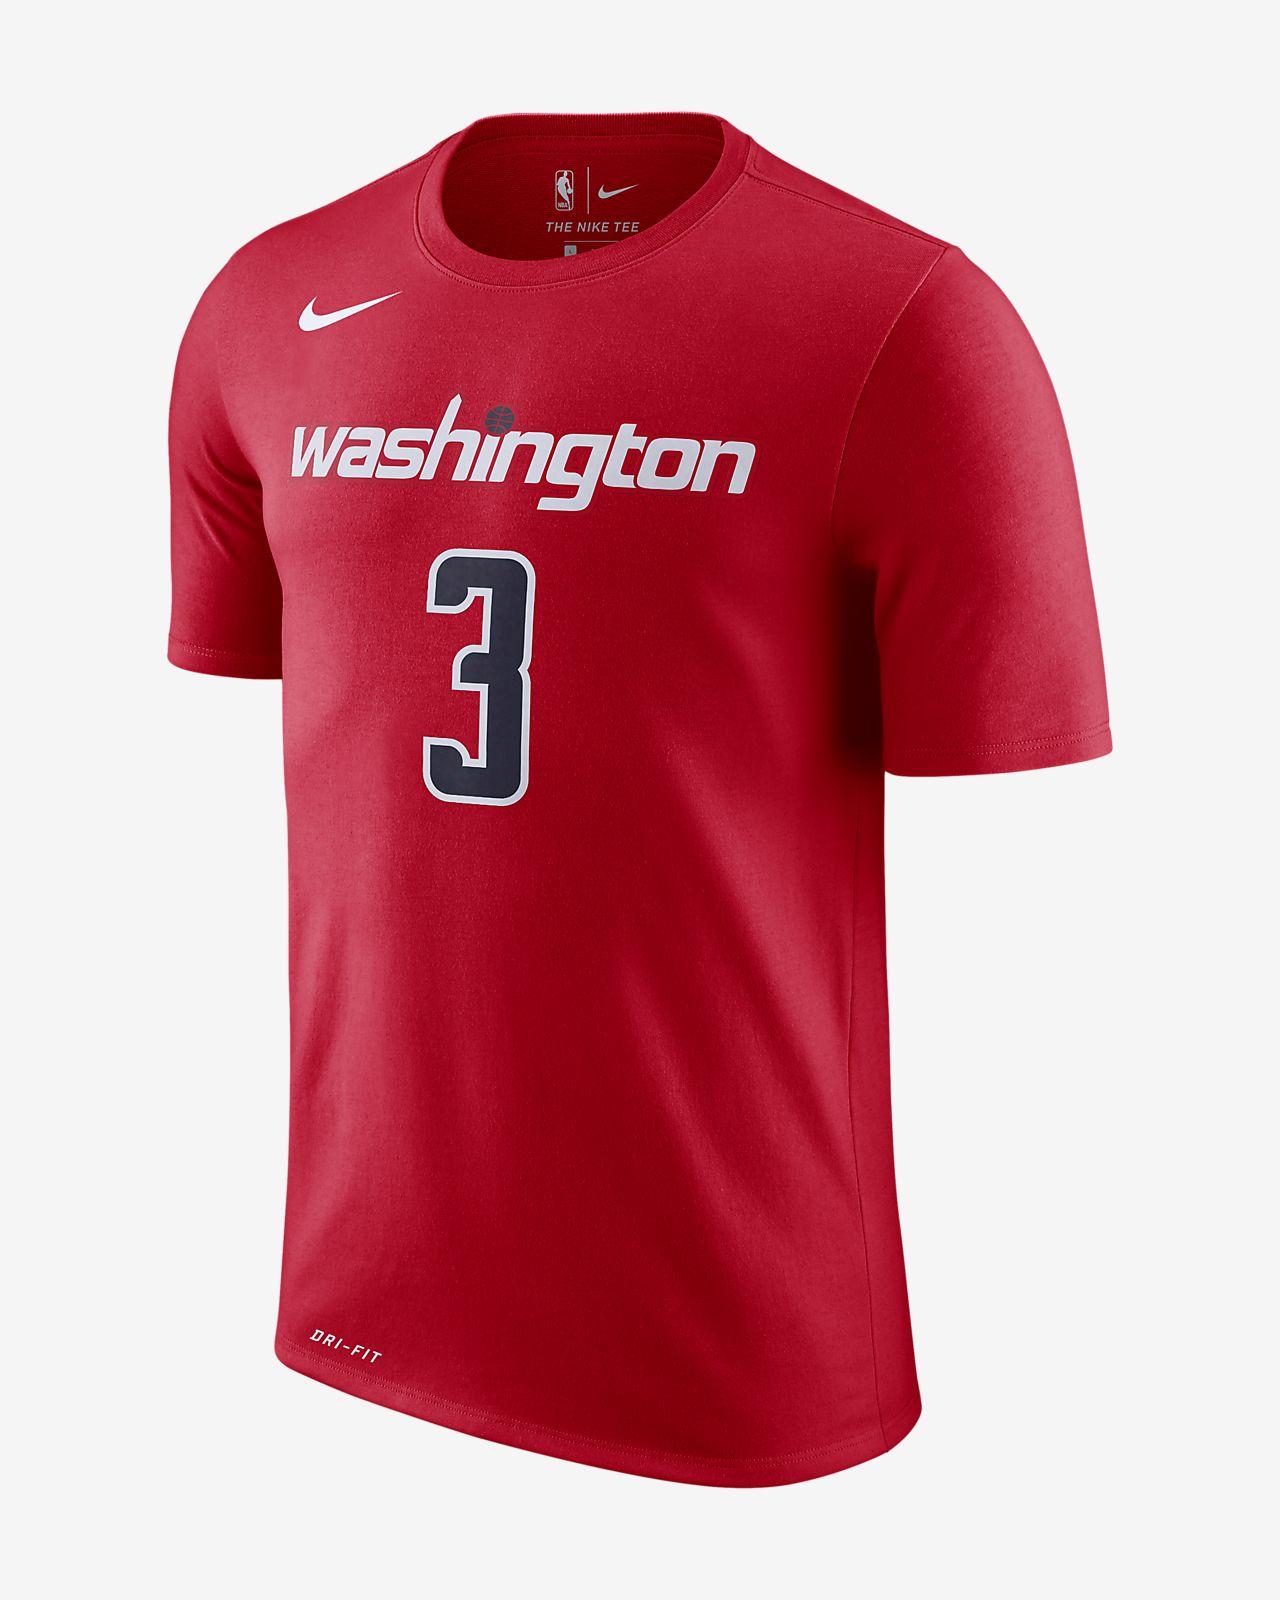 Bradley Beal Washington Wizards Nike Dri-FIT Men's NBA T-Shirt